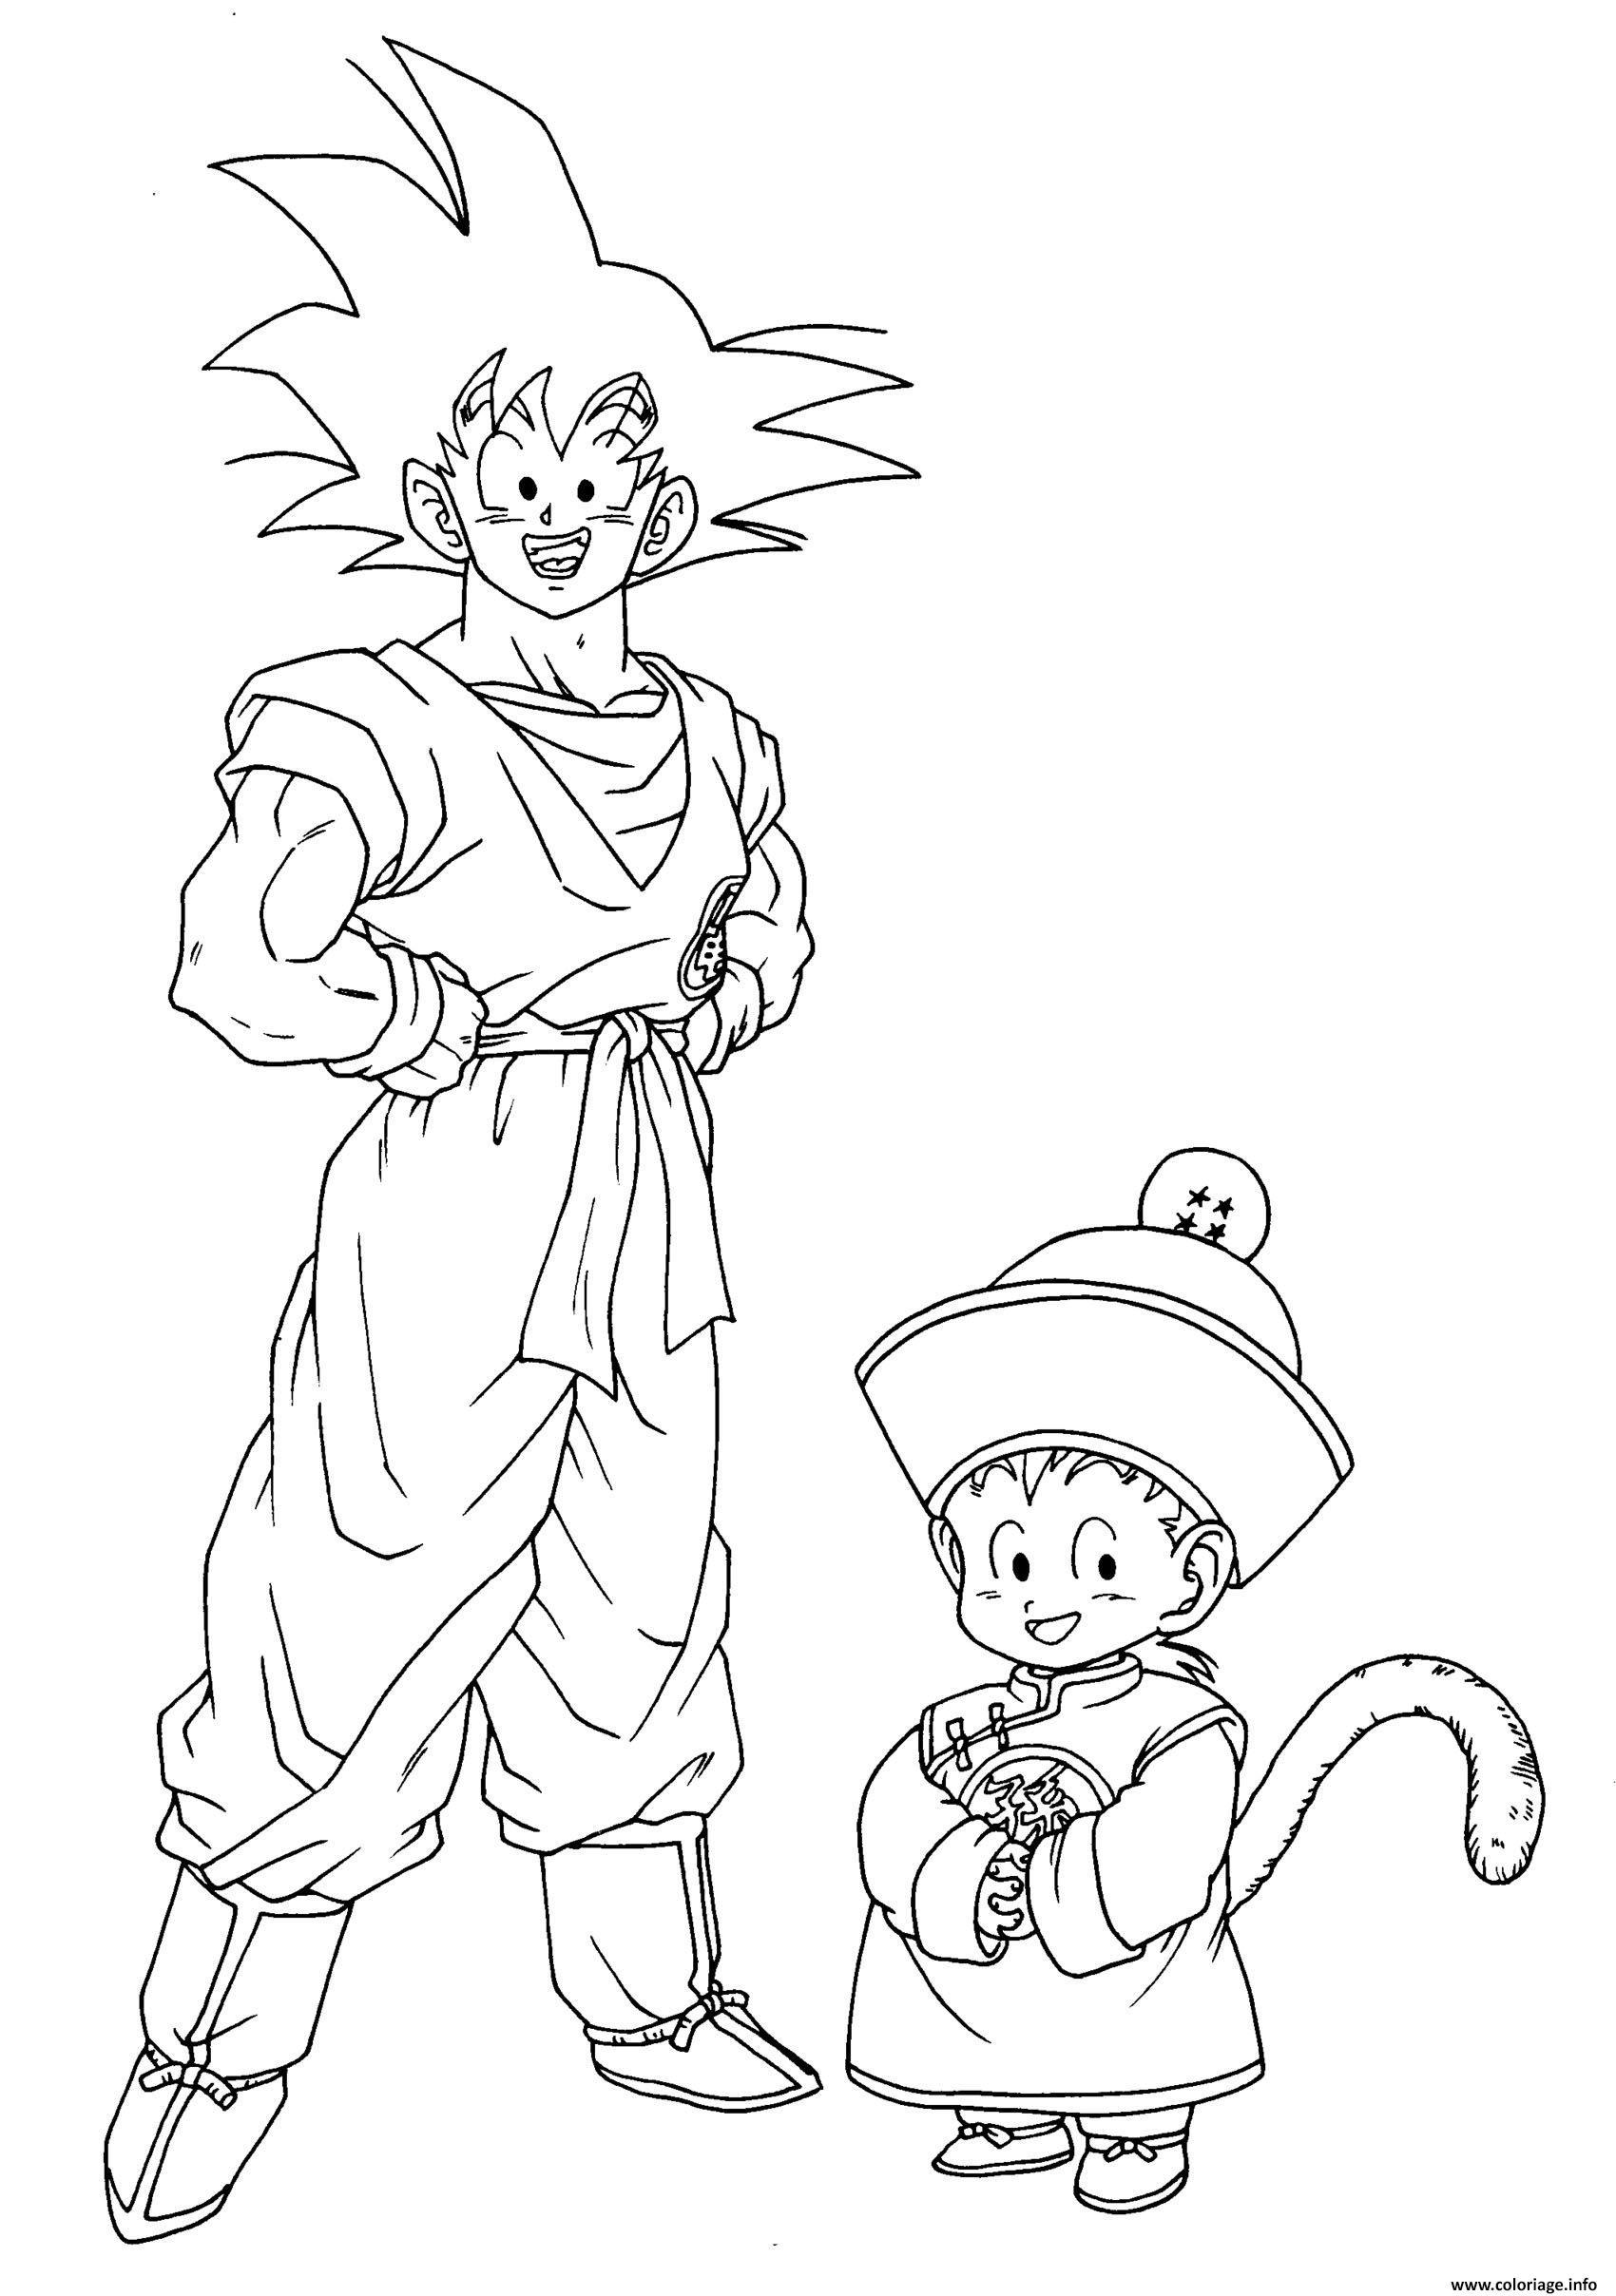 Coloriage Dragon Ball Z Goku Et Goten Dessin